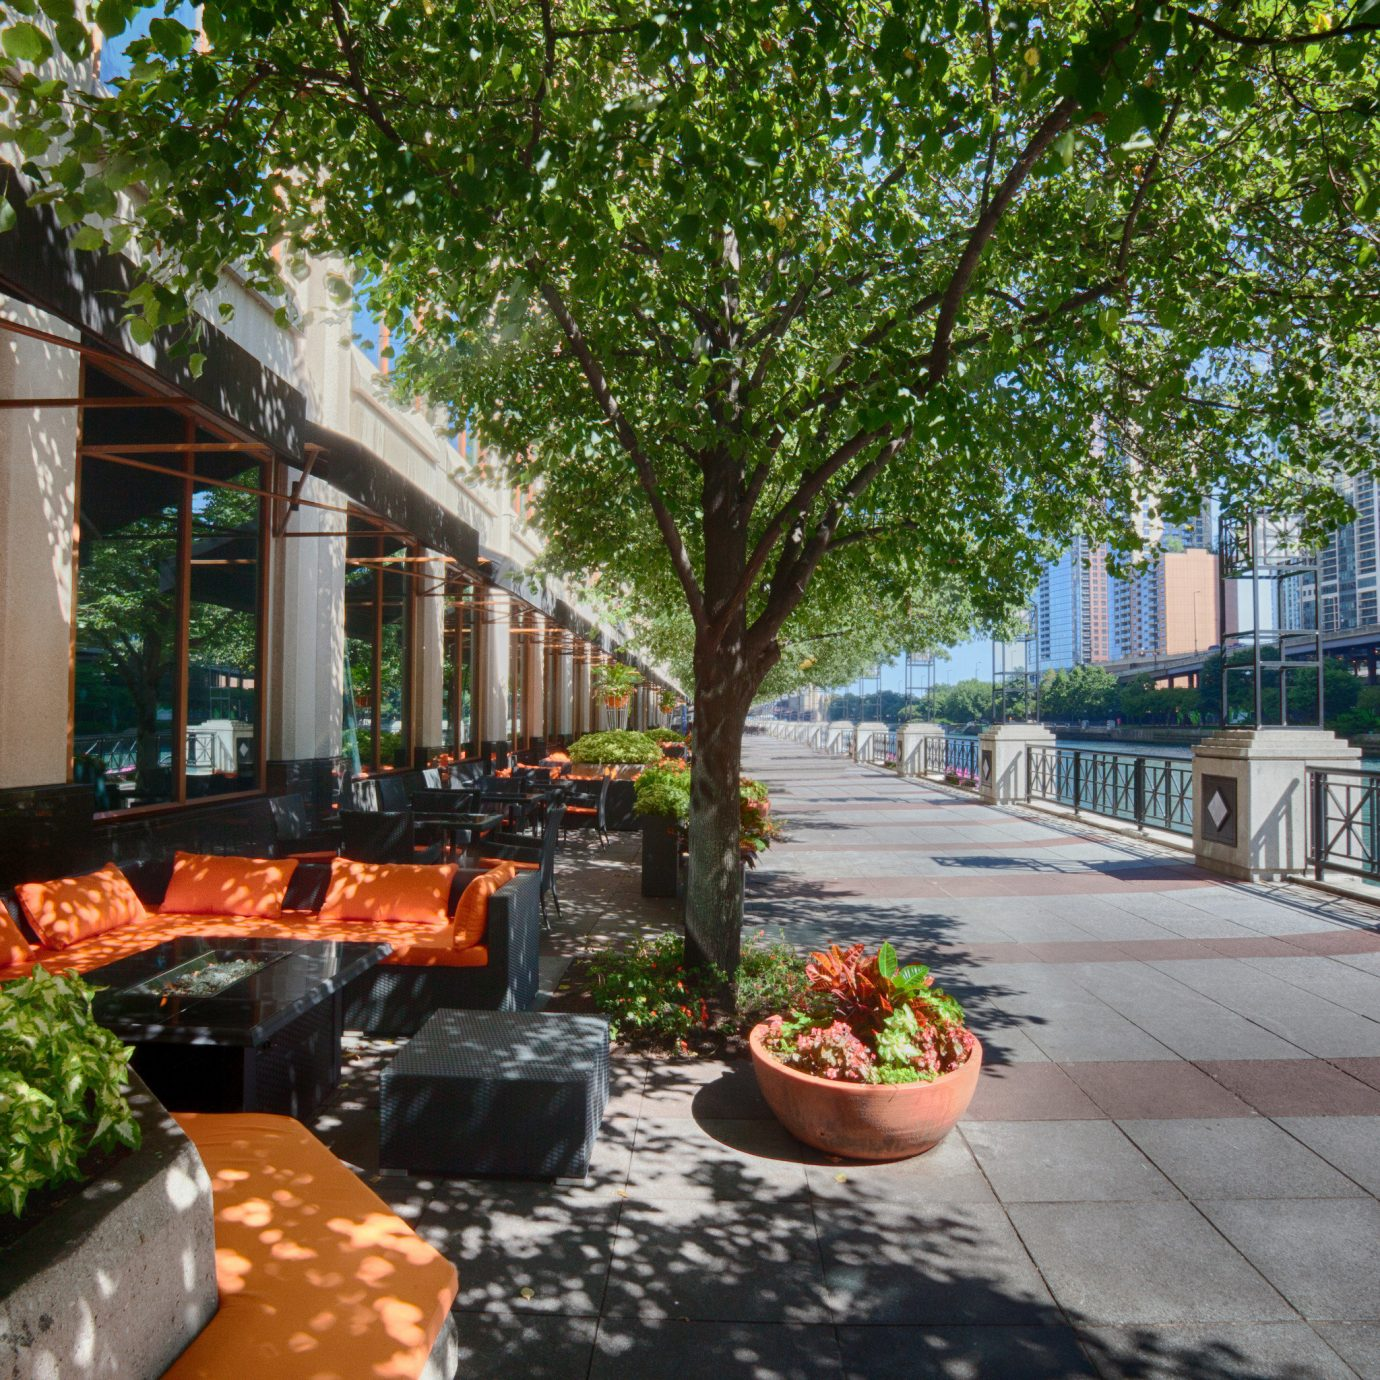 tree property Courtyard backyard walkway yard home residential area condominium Garden Resort outdoor structure